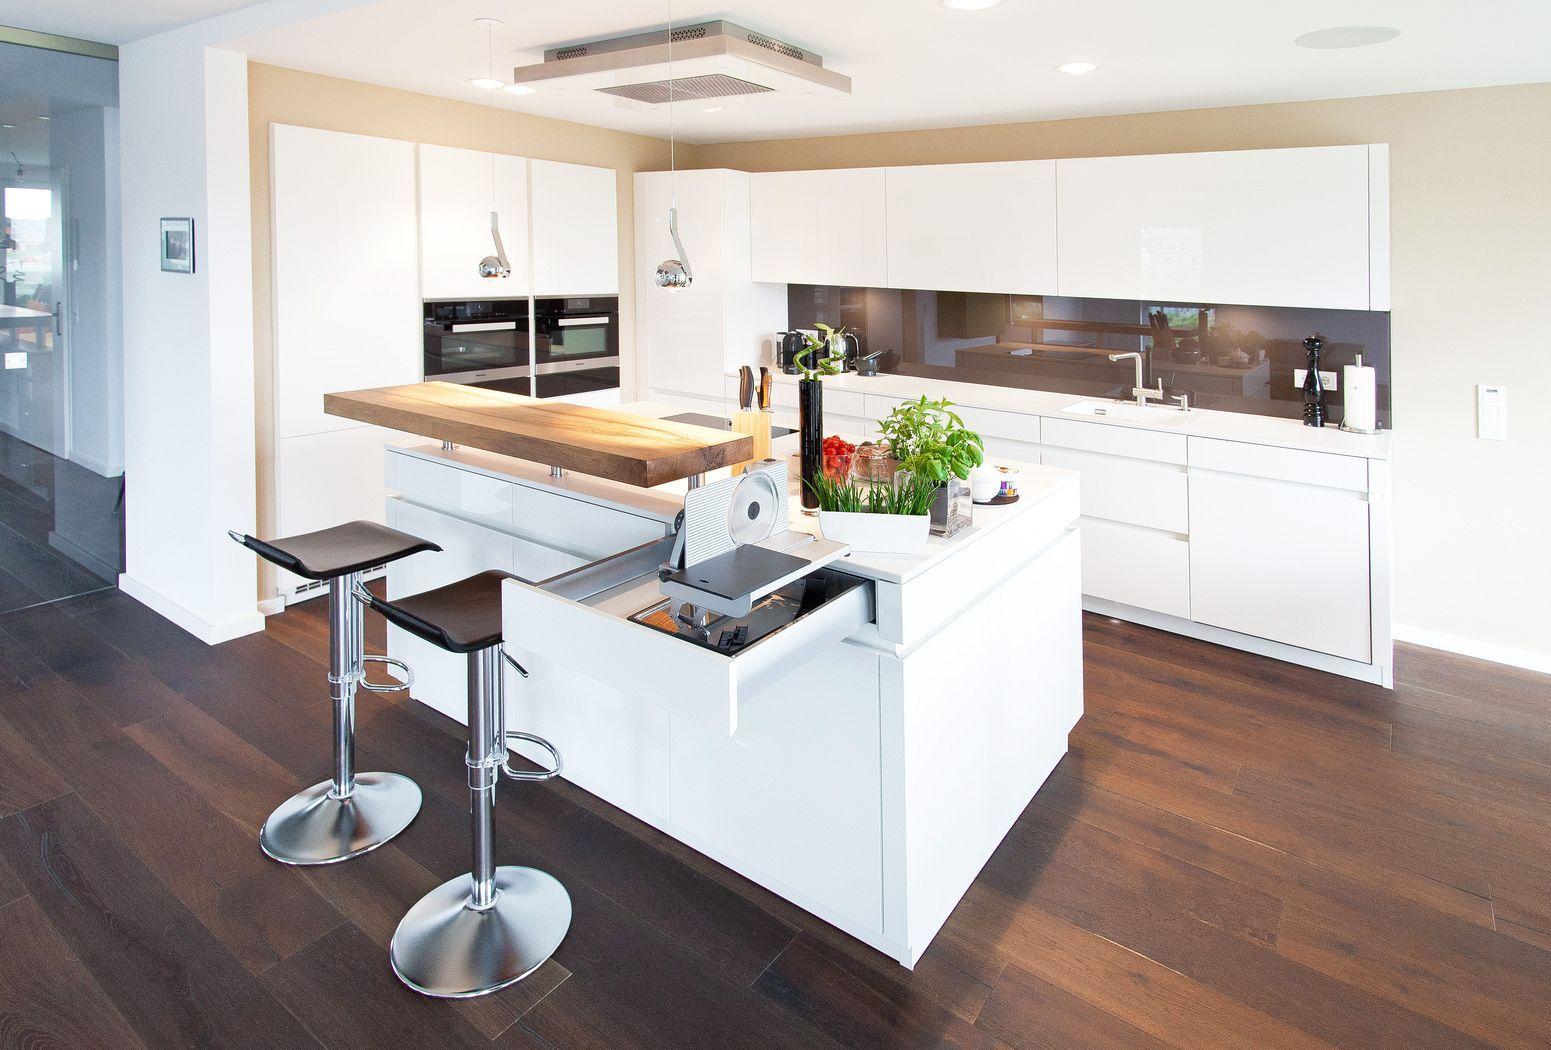 Ikea Küche Mit Kochinsel Preis